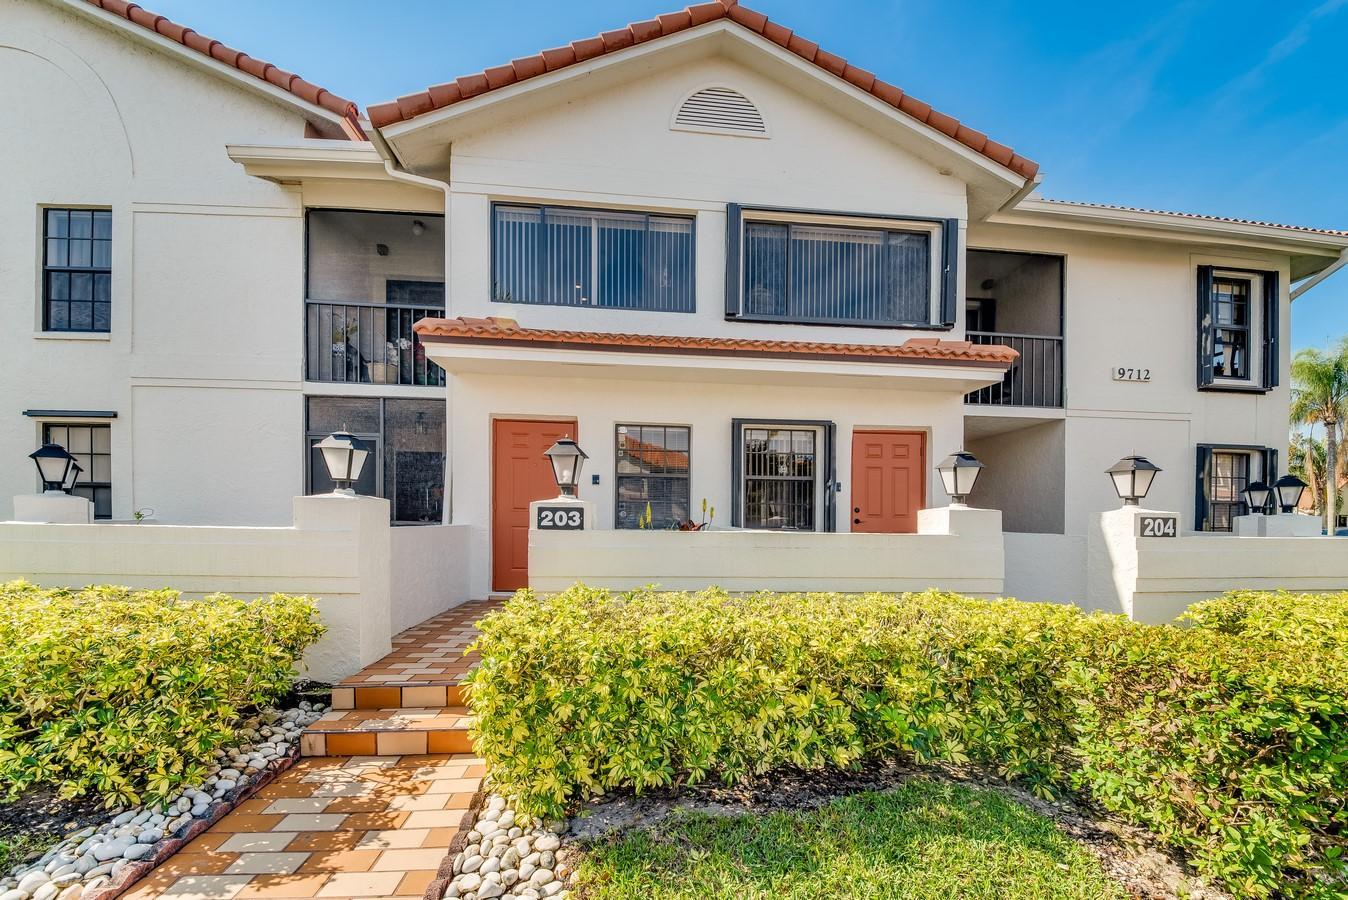 9712 Pavarotti Terrace 203 Boynton Beach, FL 33437